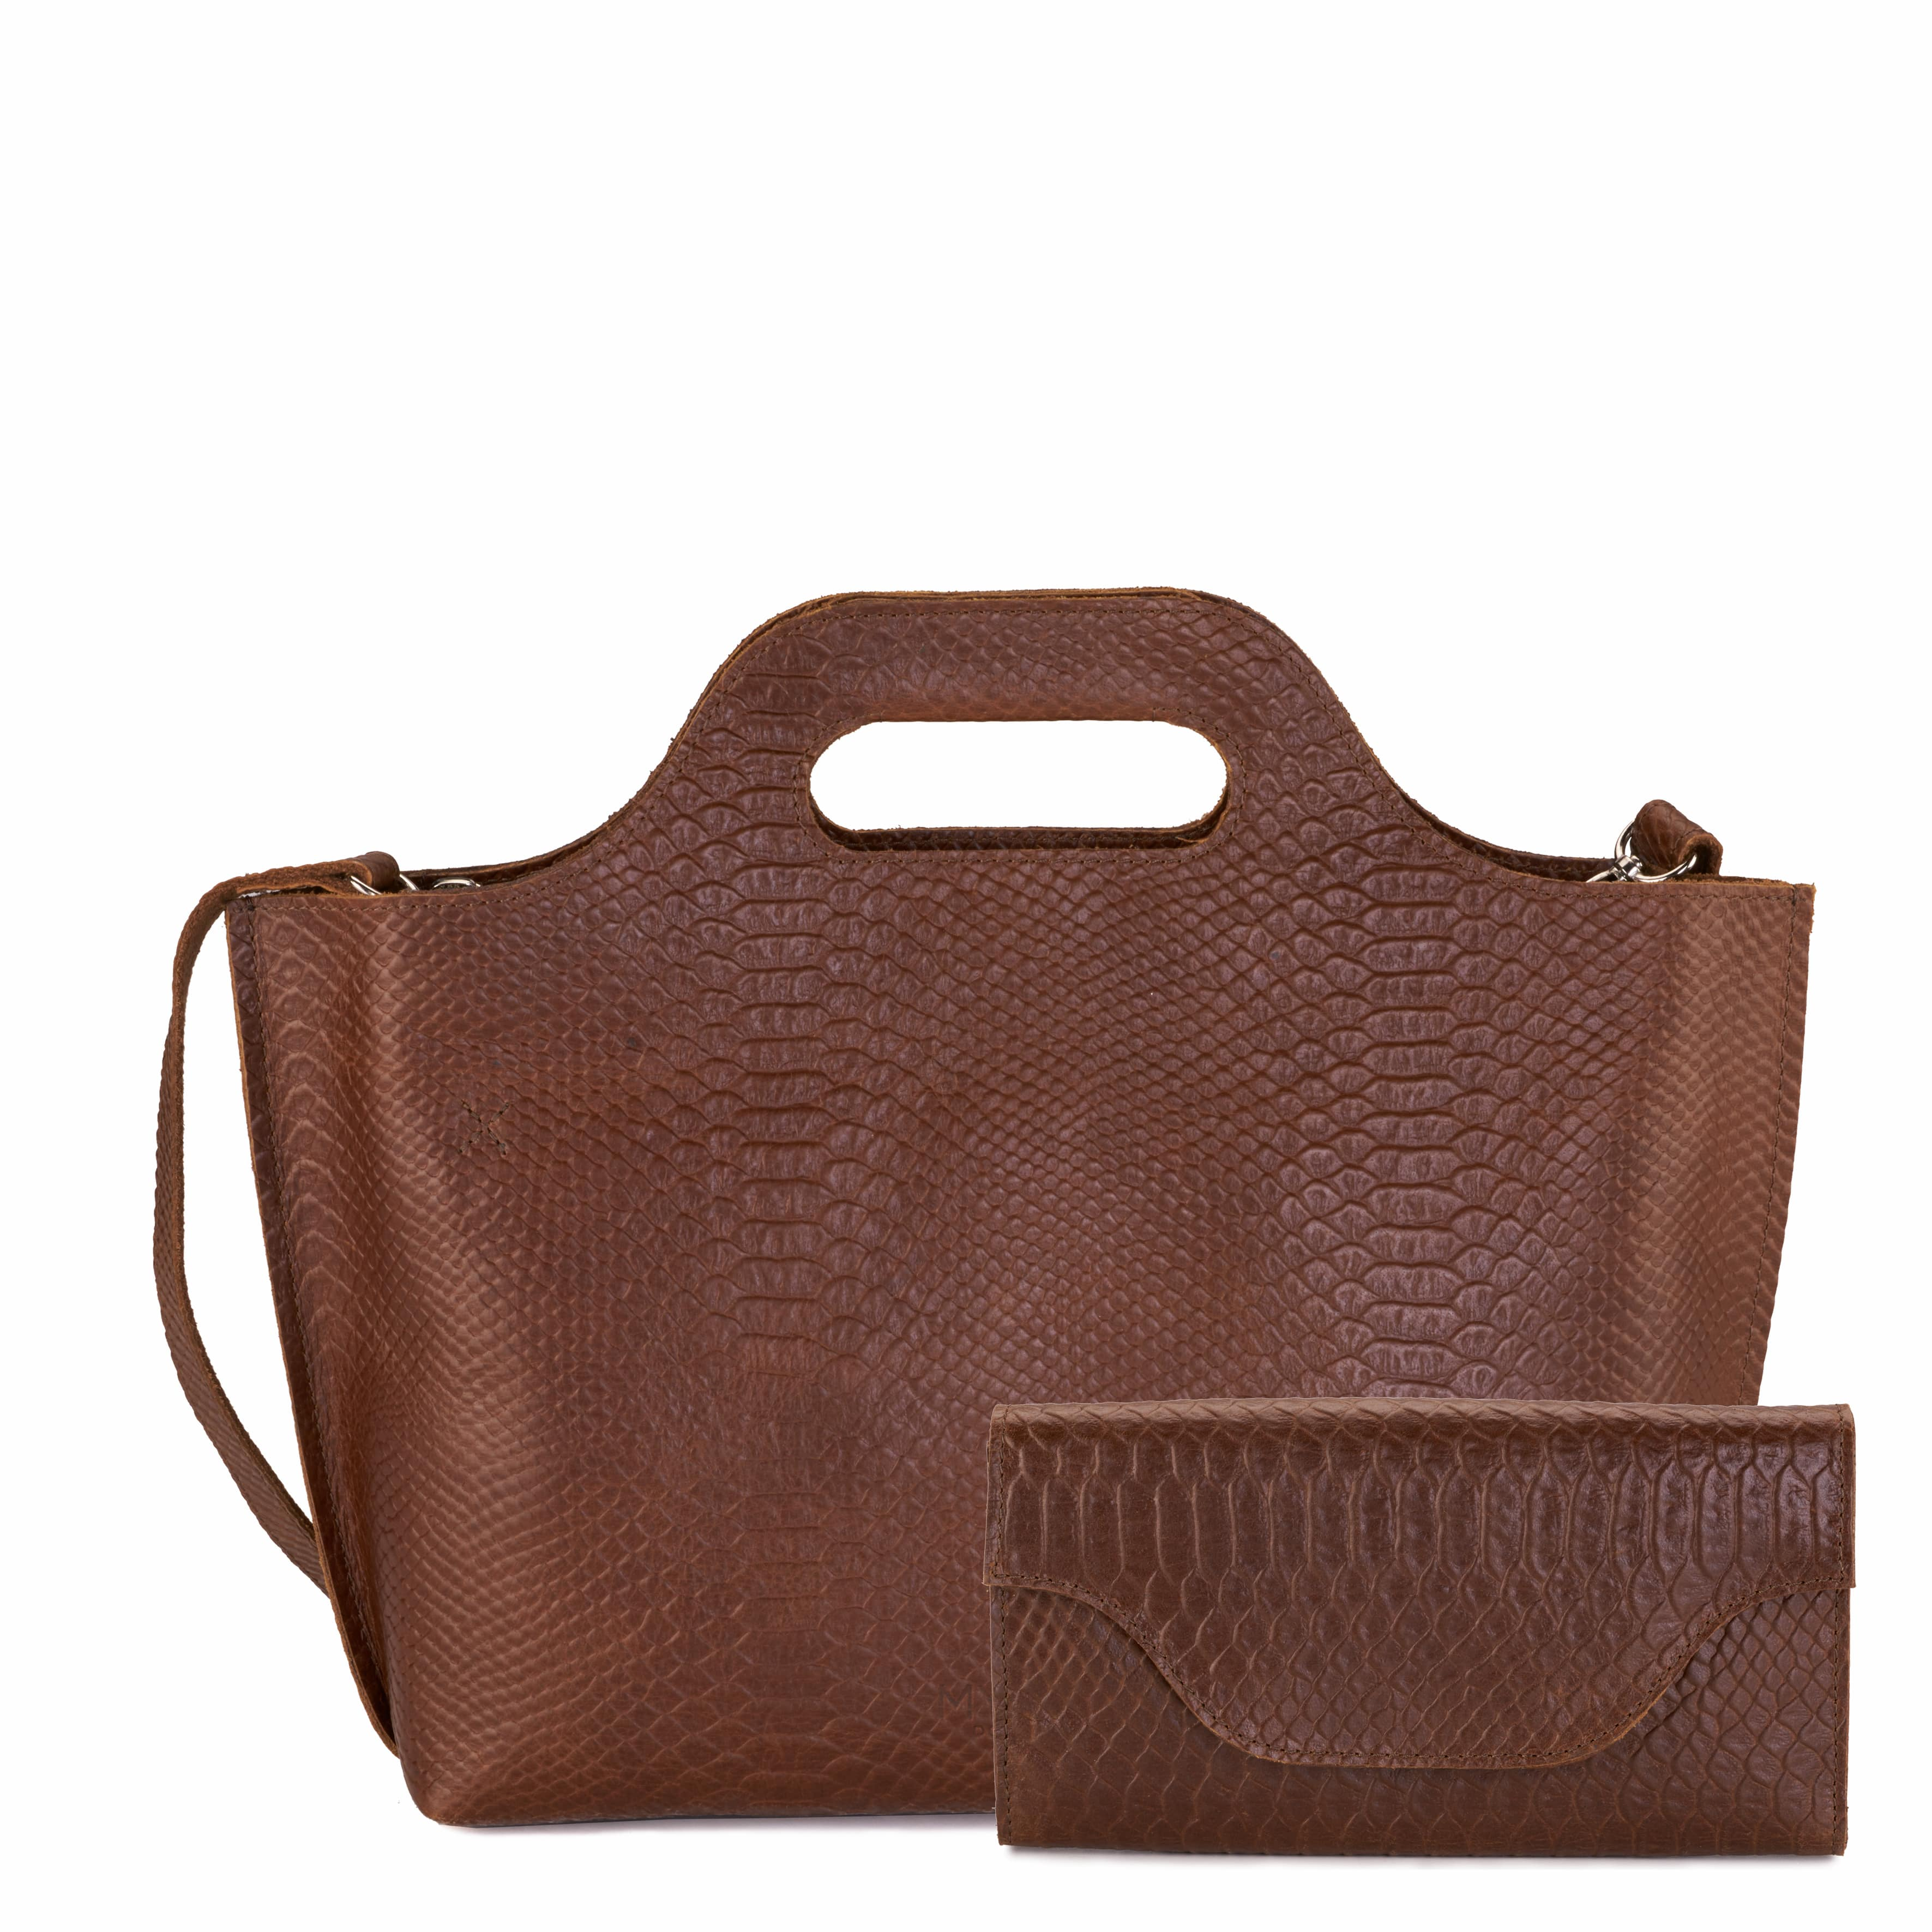 MY CARRY BAG Handbag – anaconda brandy